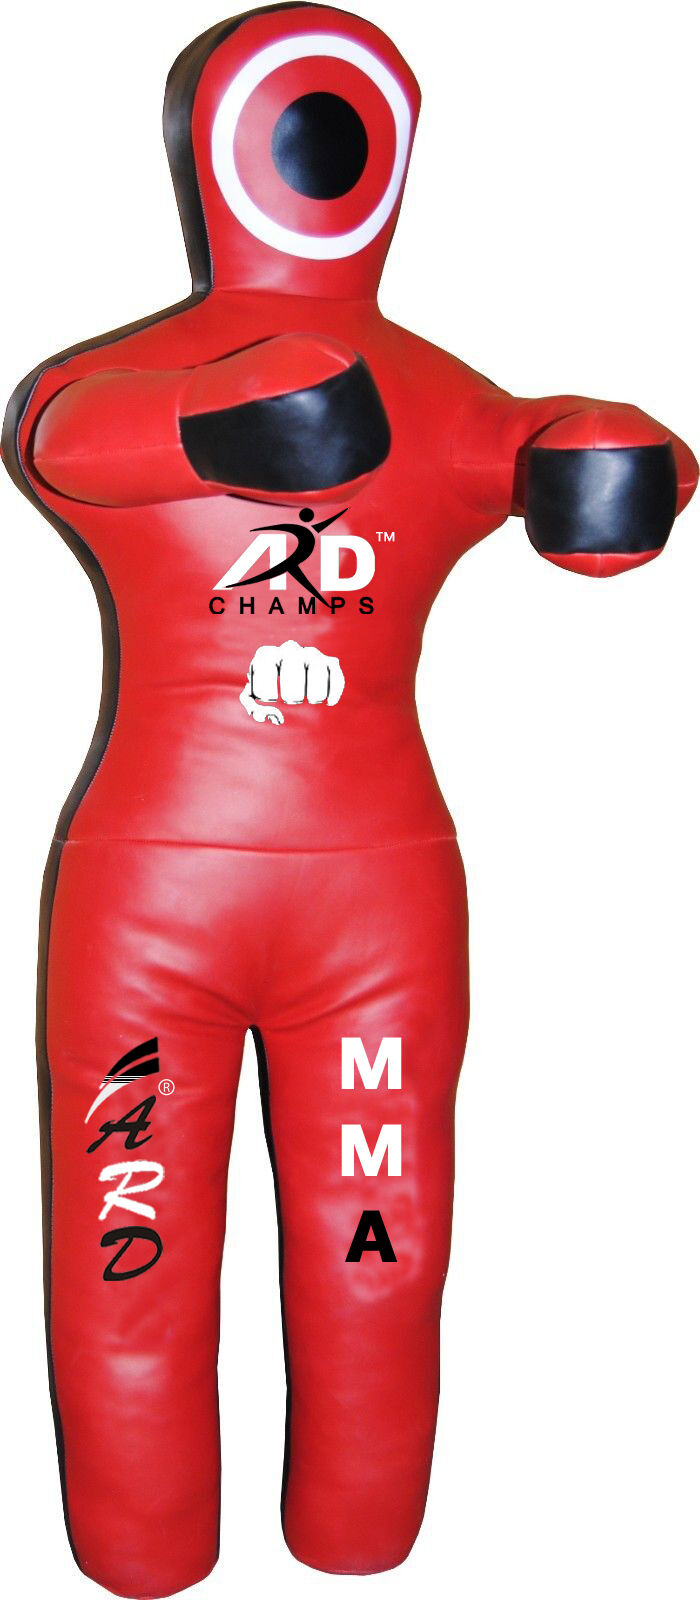 2Fit™ Brazilian Jiu Jitsu Leather Grappling Dummy MMA Wrestling Martial Arts-Red